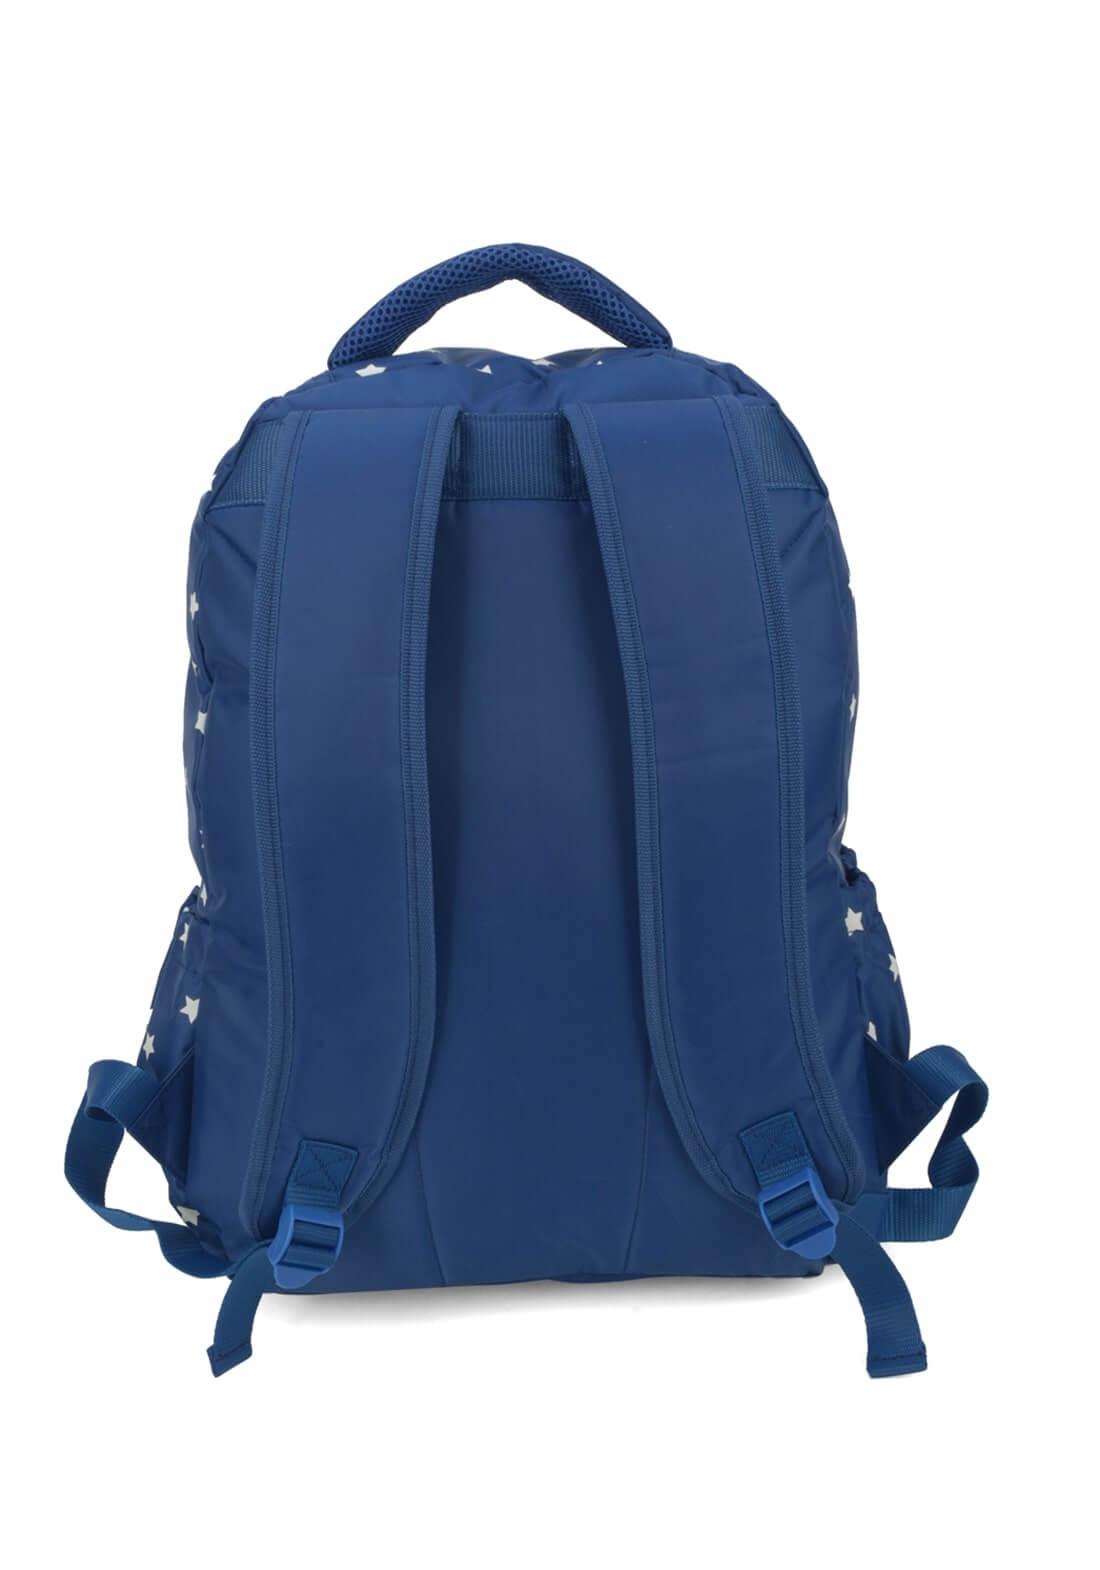 Mochila Mulher Maravilha Azul Porta Laptop Notebook Original